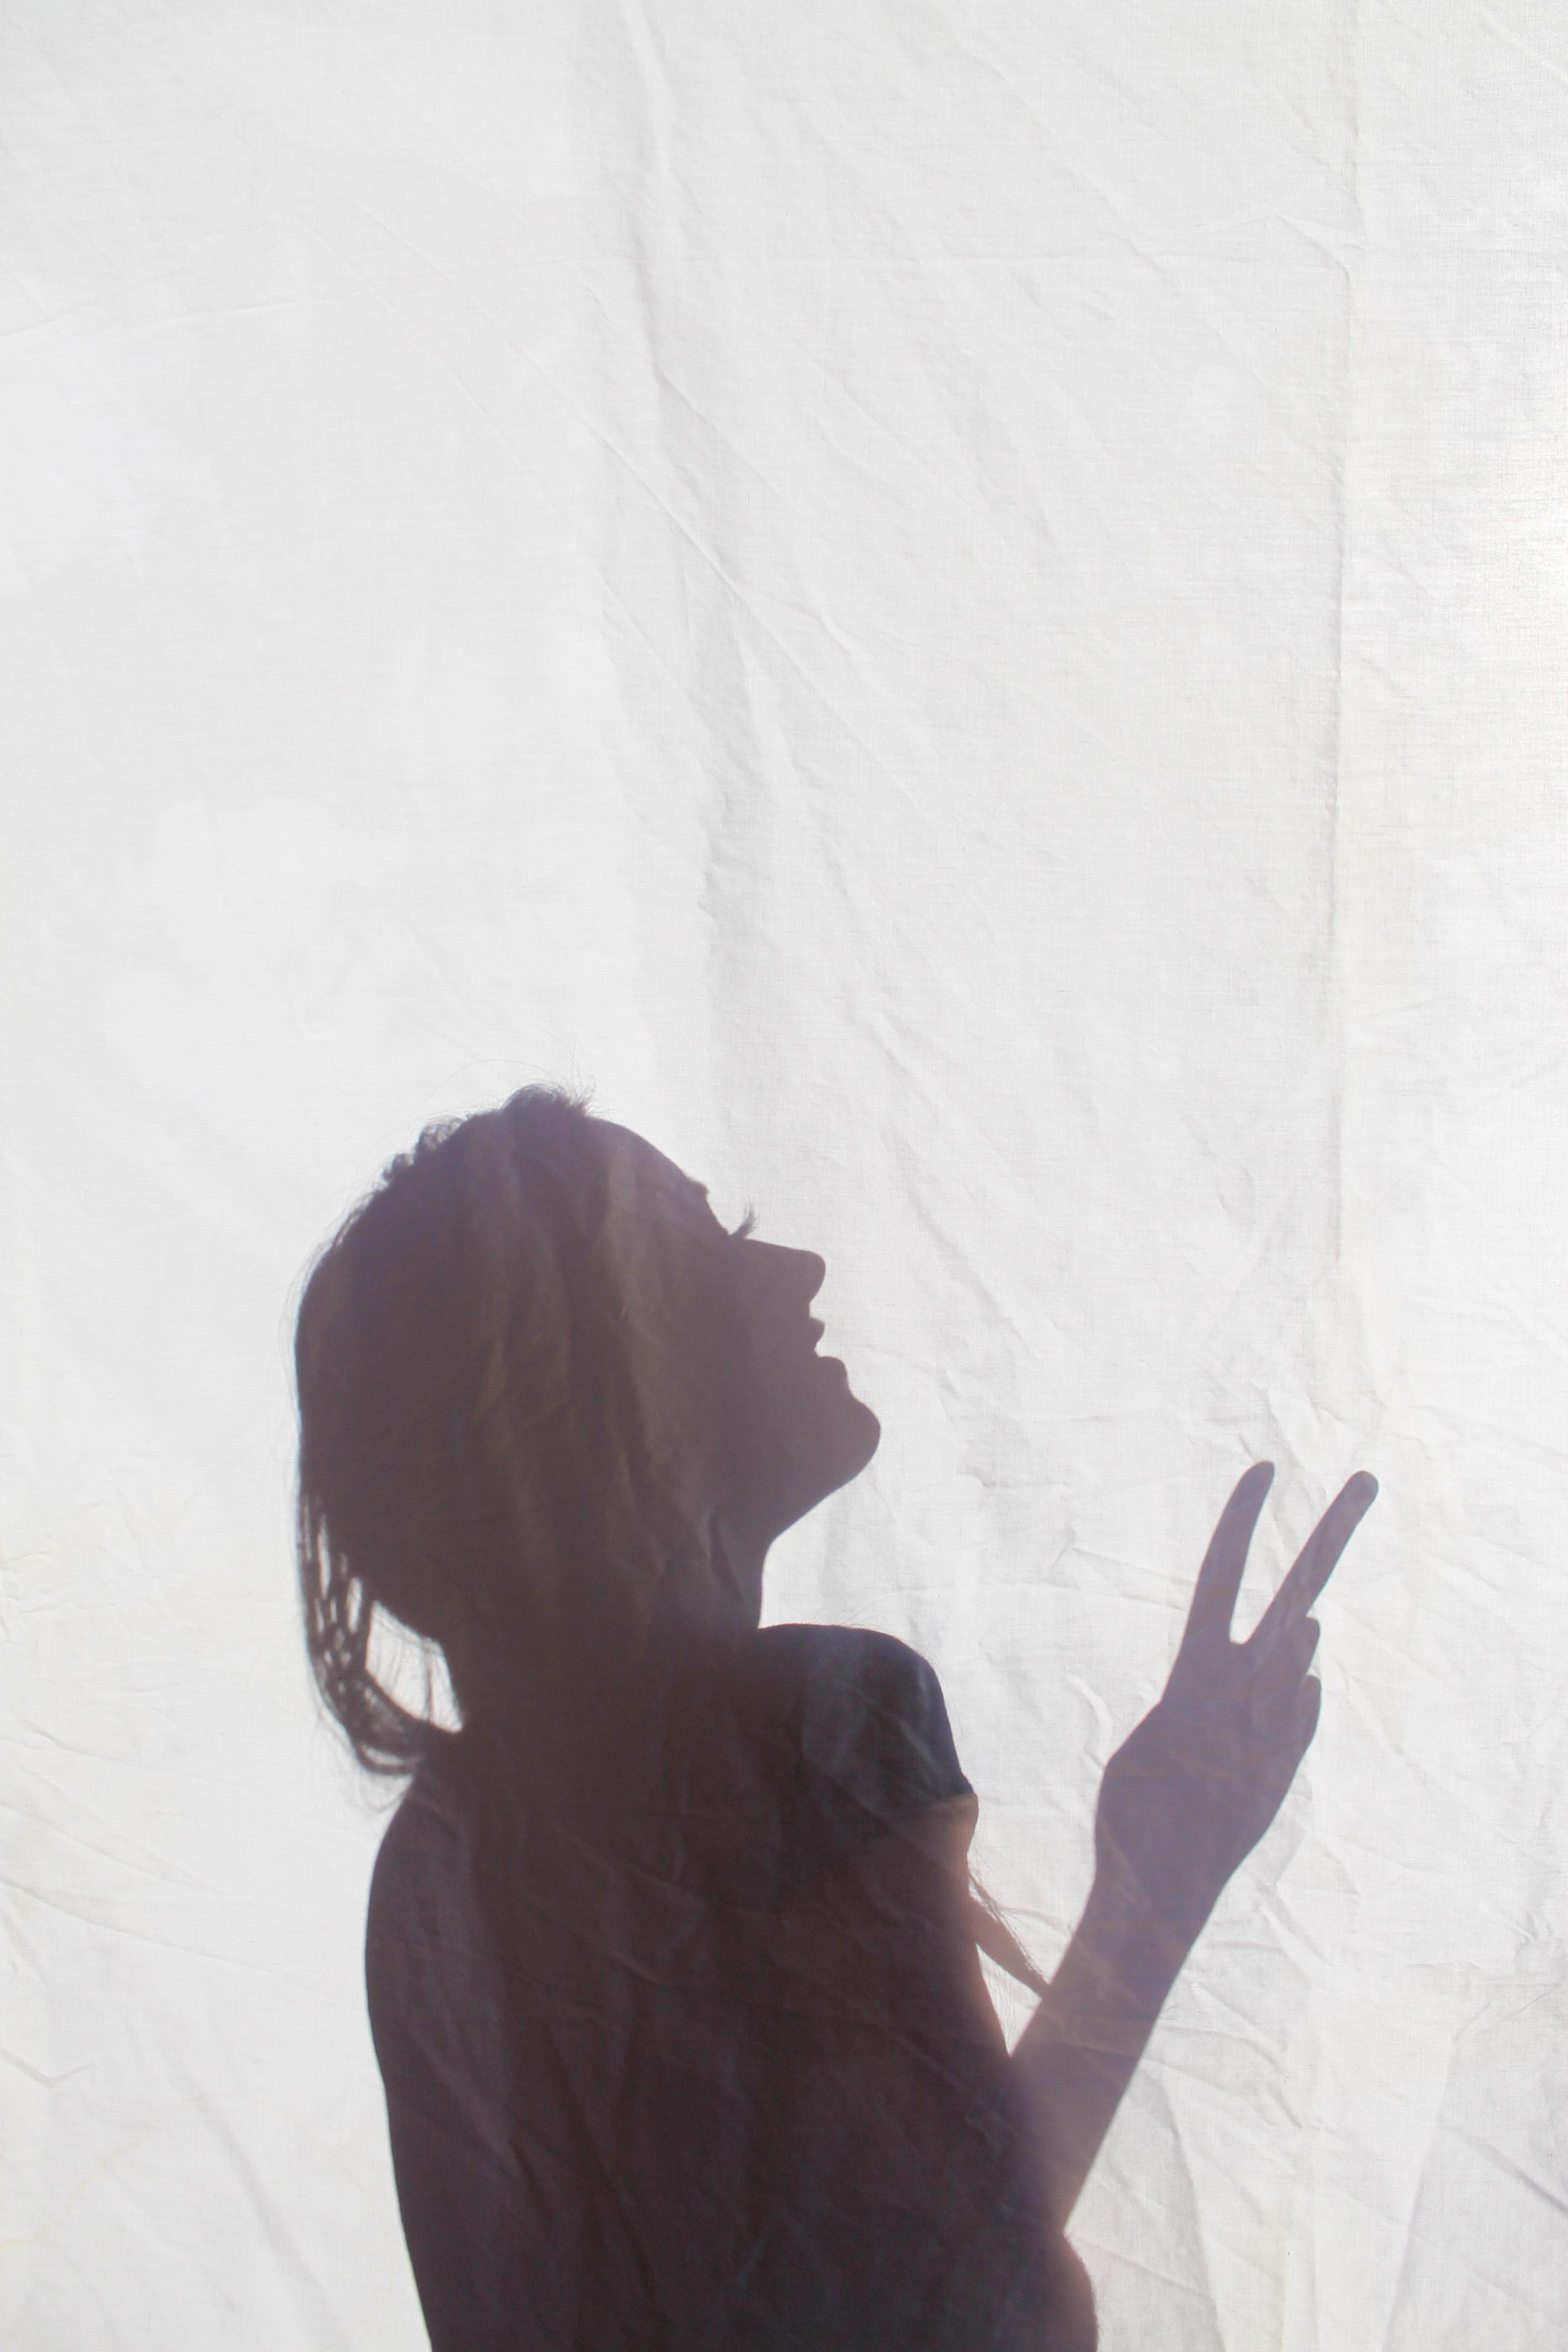 Gambar Tangan Bayangan Hitam Putih Liar Bersantai